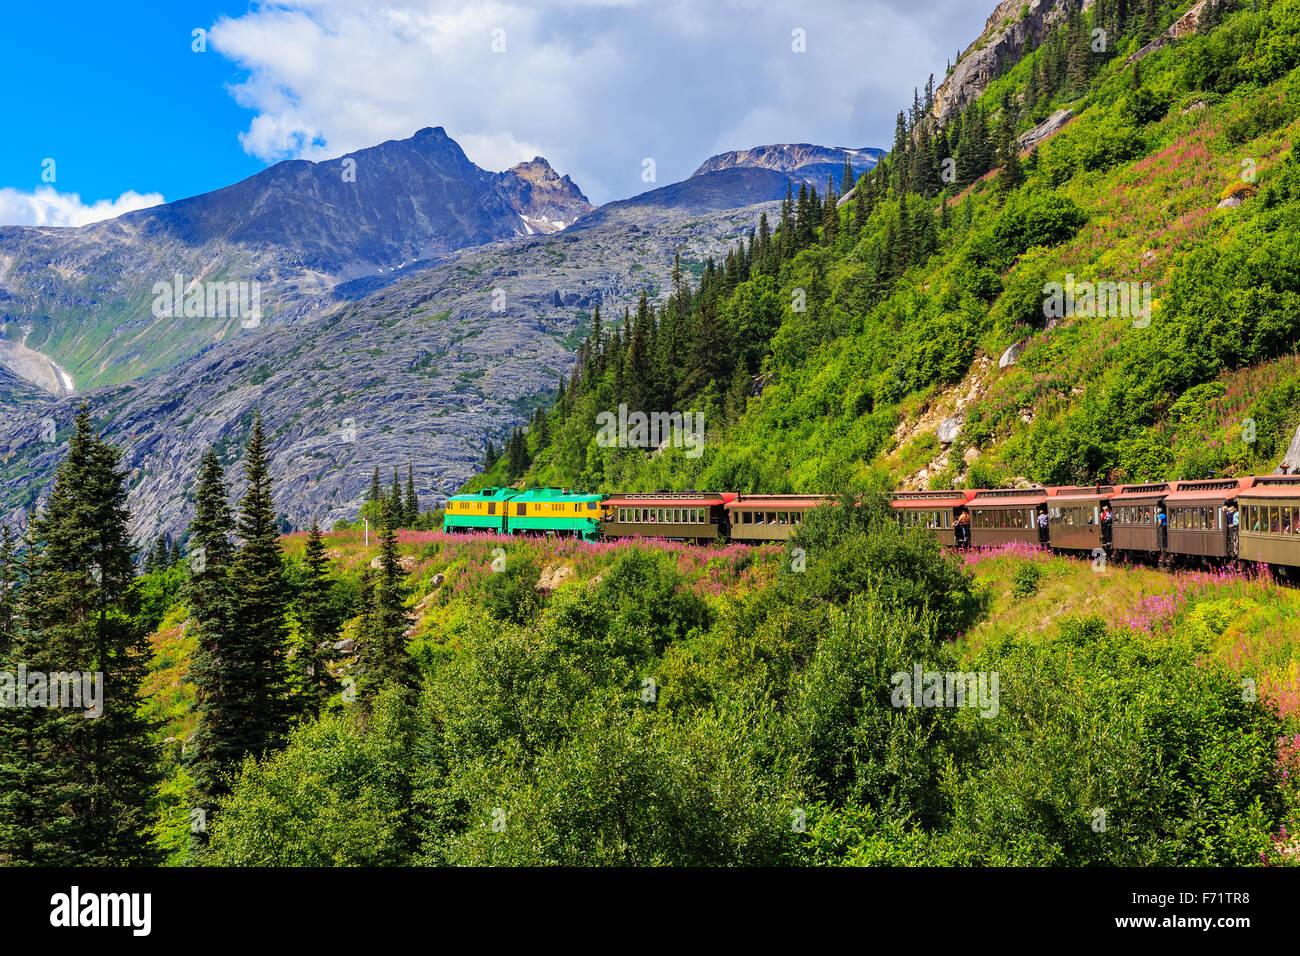 The scenic White Pass & Yukon Route Railroad. Skagway, Alaska - Stock Image